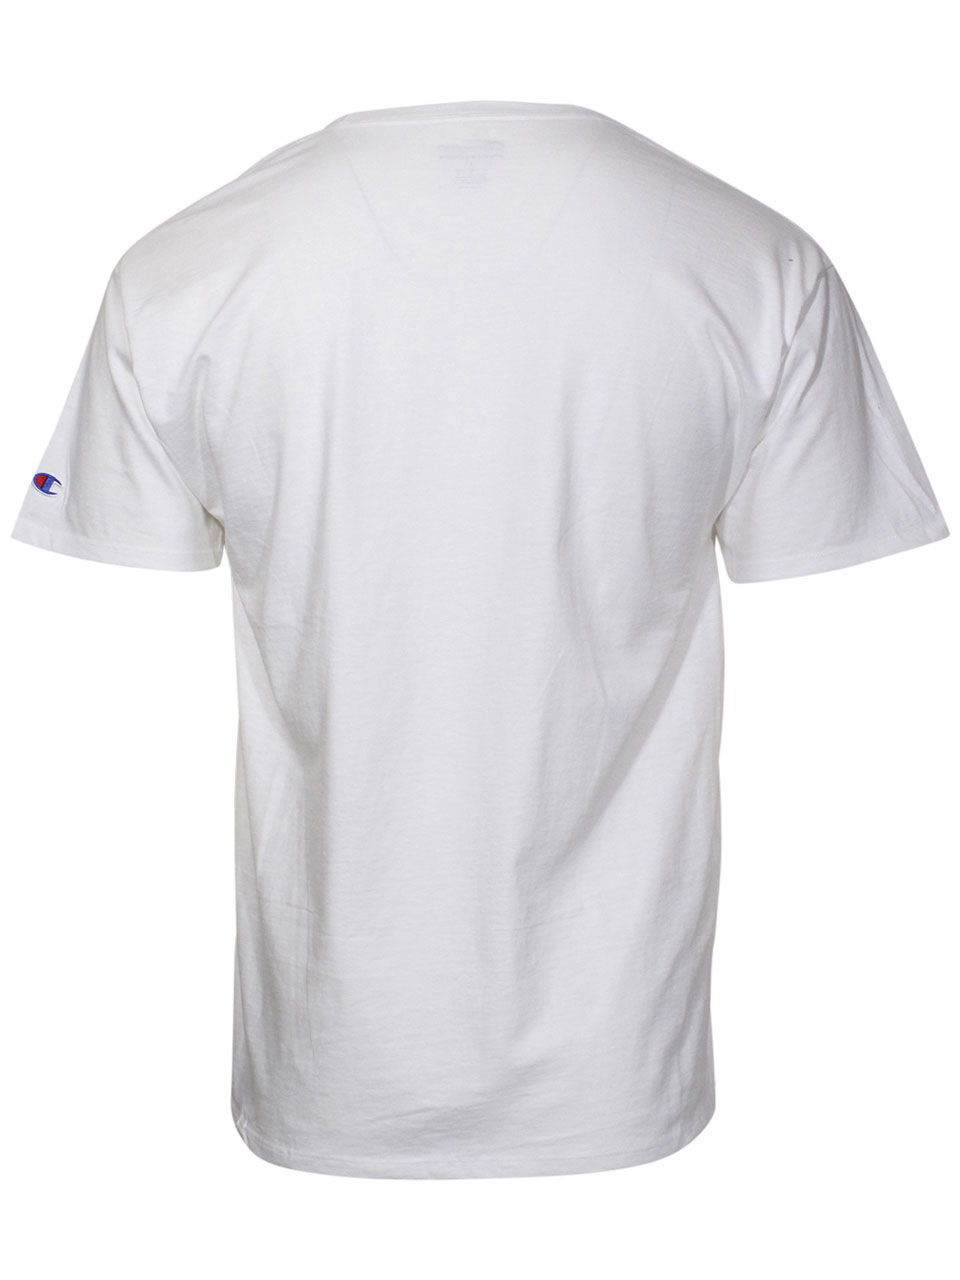 Champion-Split-Script-Logo-Jersey-T-Shirt-Men-039-s-Short-Sleeve-Crew-Neck-Cotton thumbnail 10